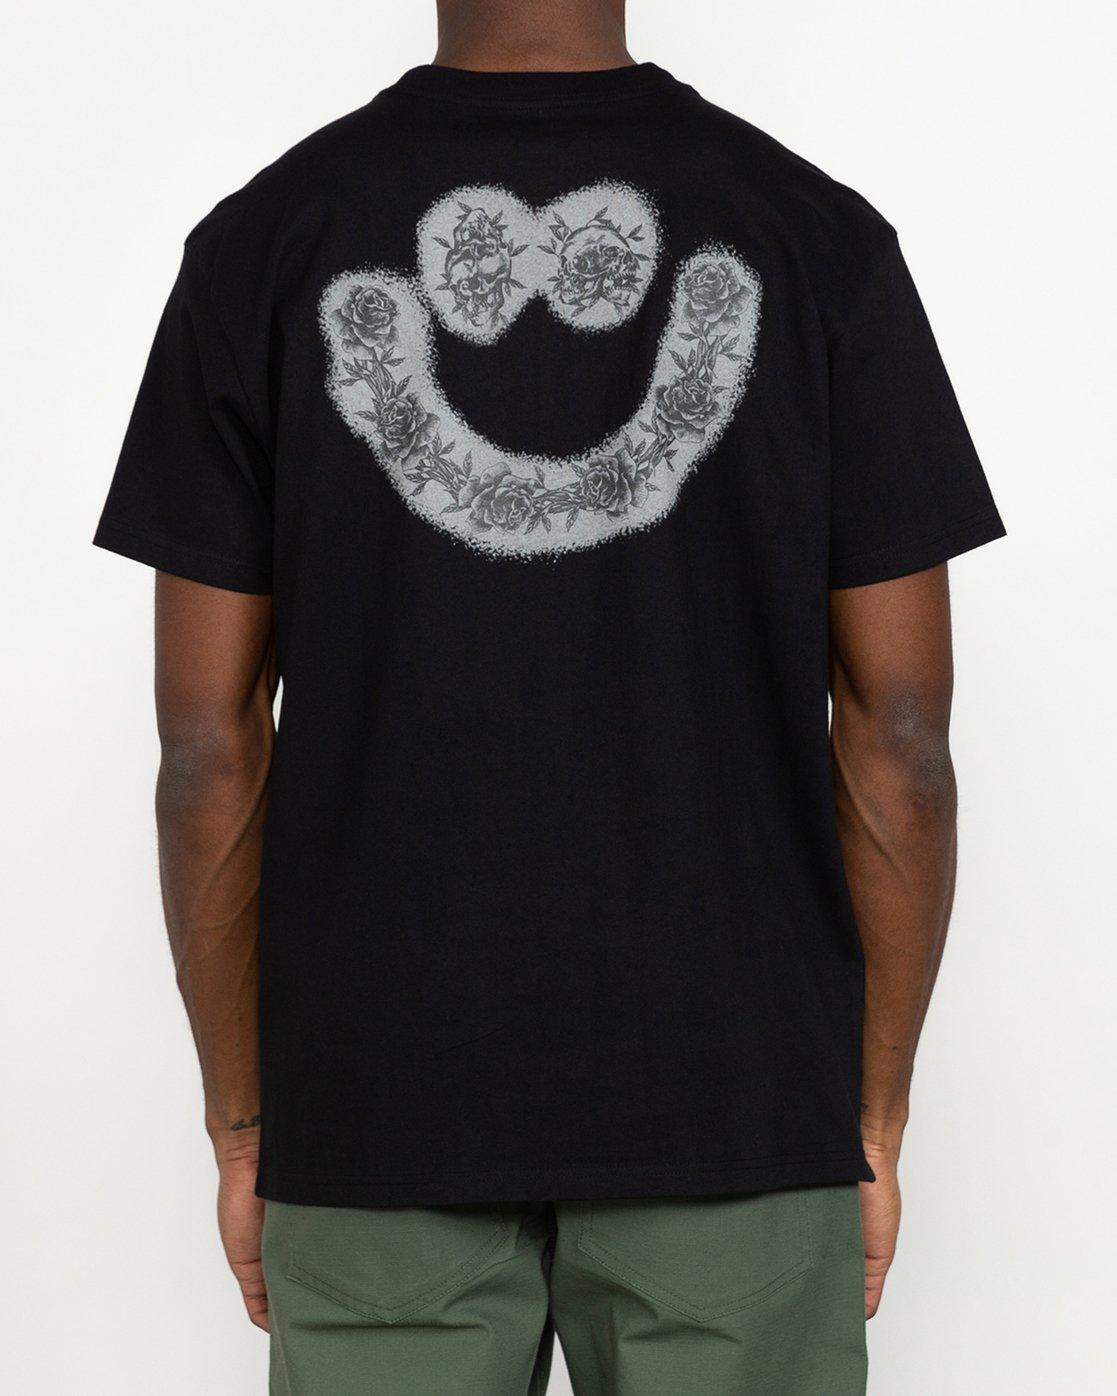 7 Benjamin JeanJean Skulls And Roses - T-Shirt for Men Black U1SSSSRVF0 RVCA